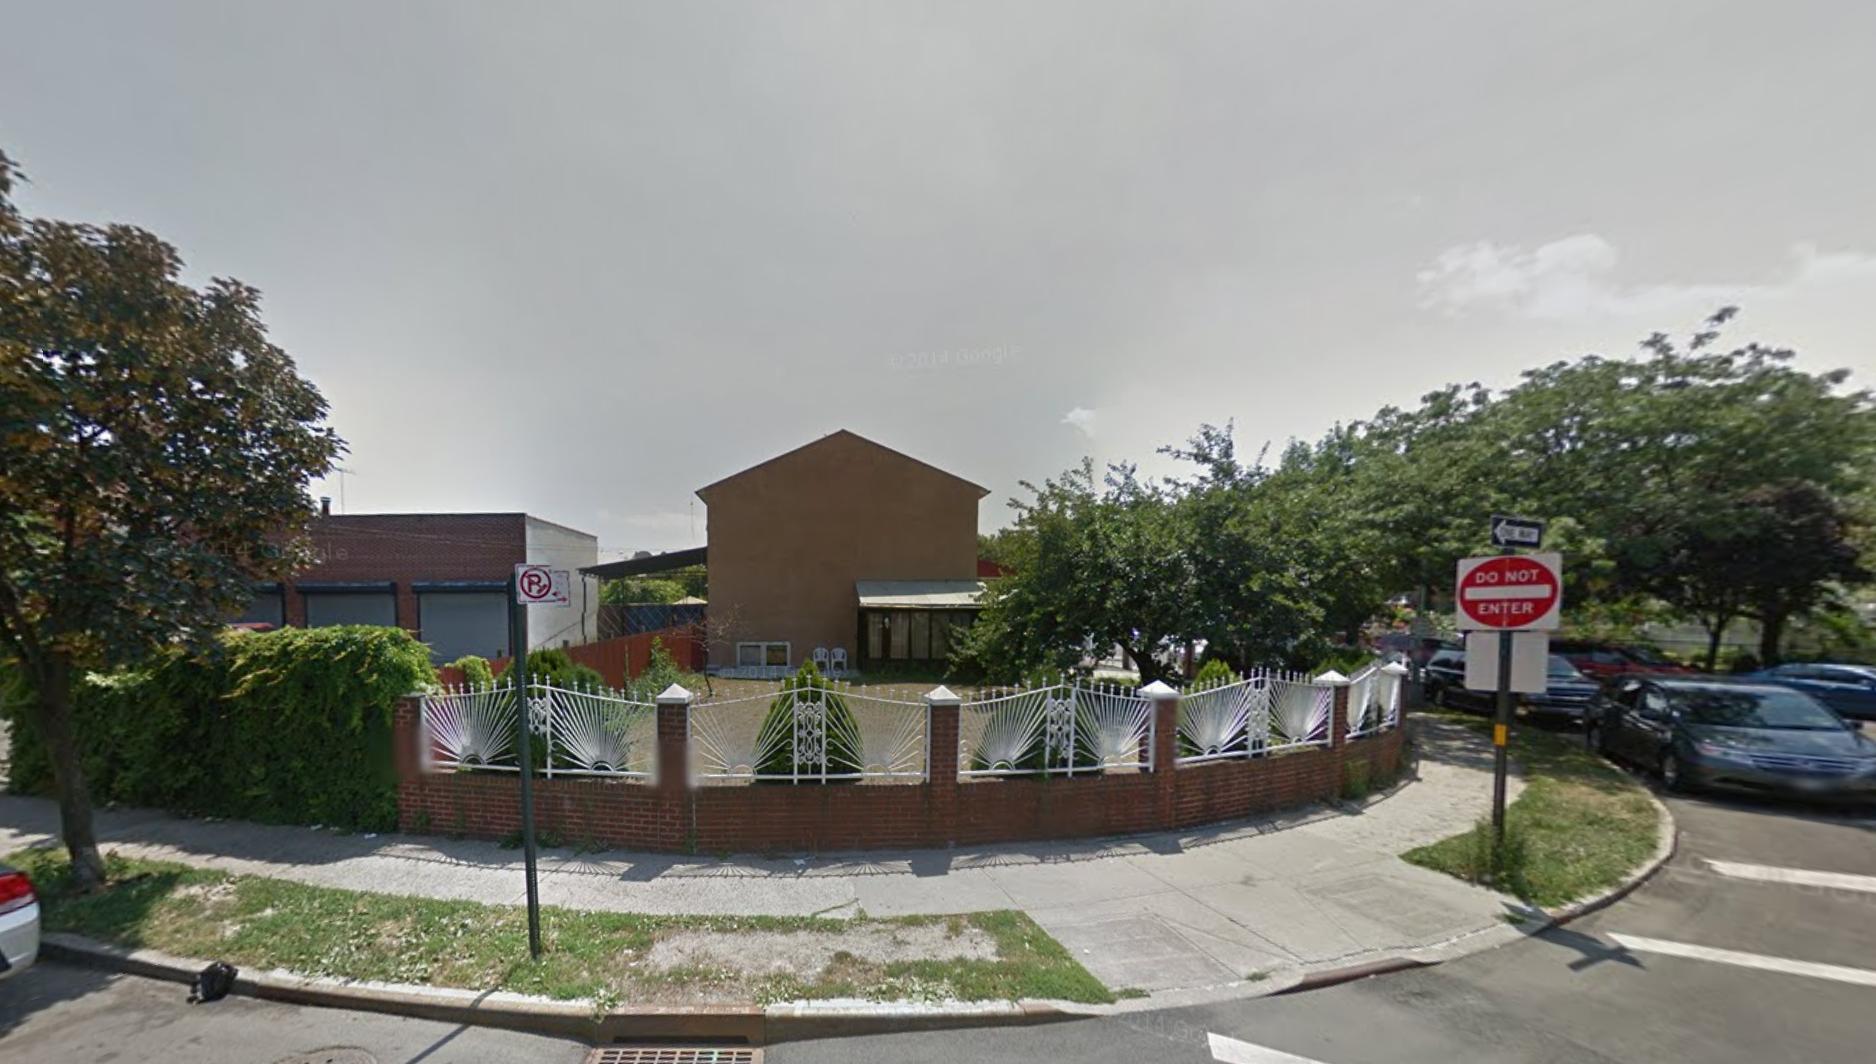 2180 Arthur Avenue, image via Google Maps